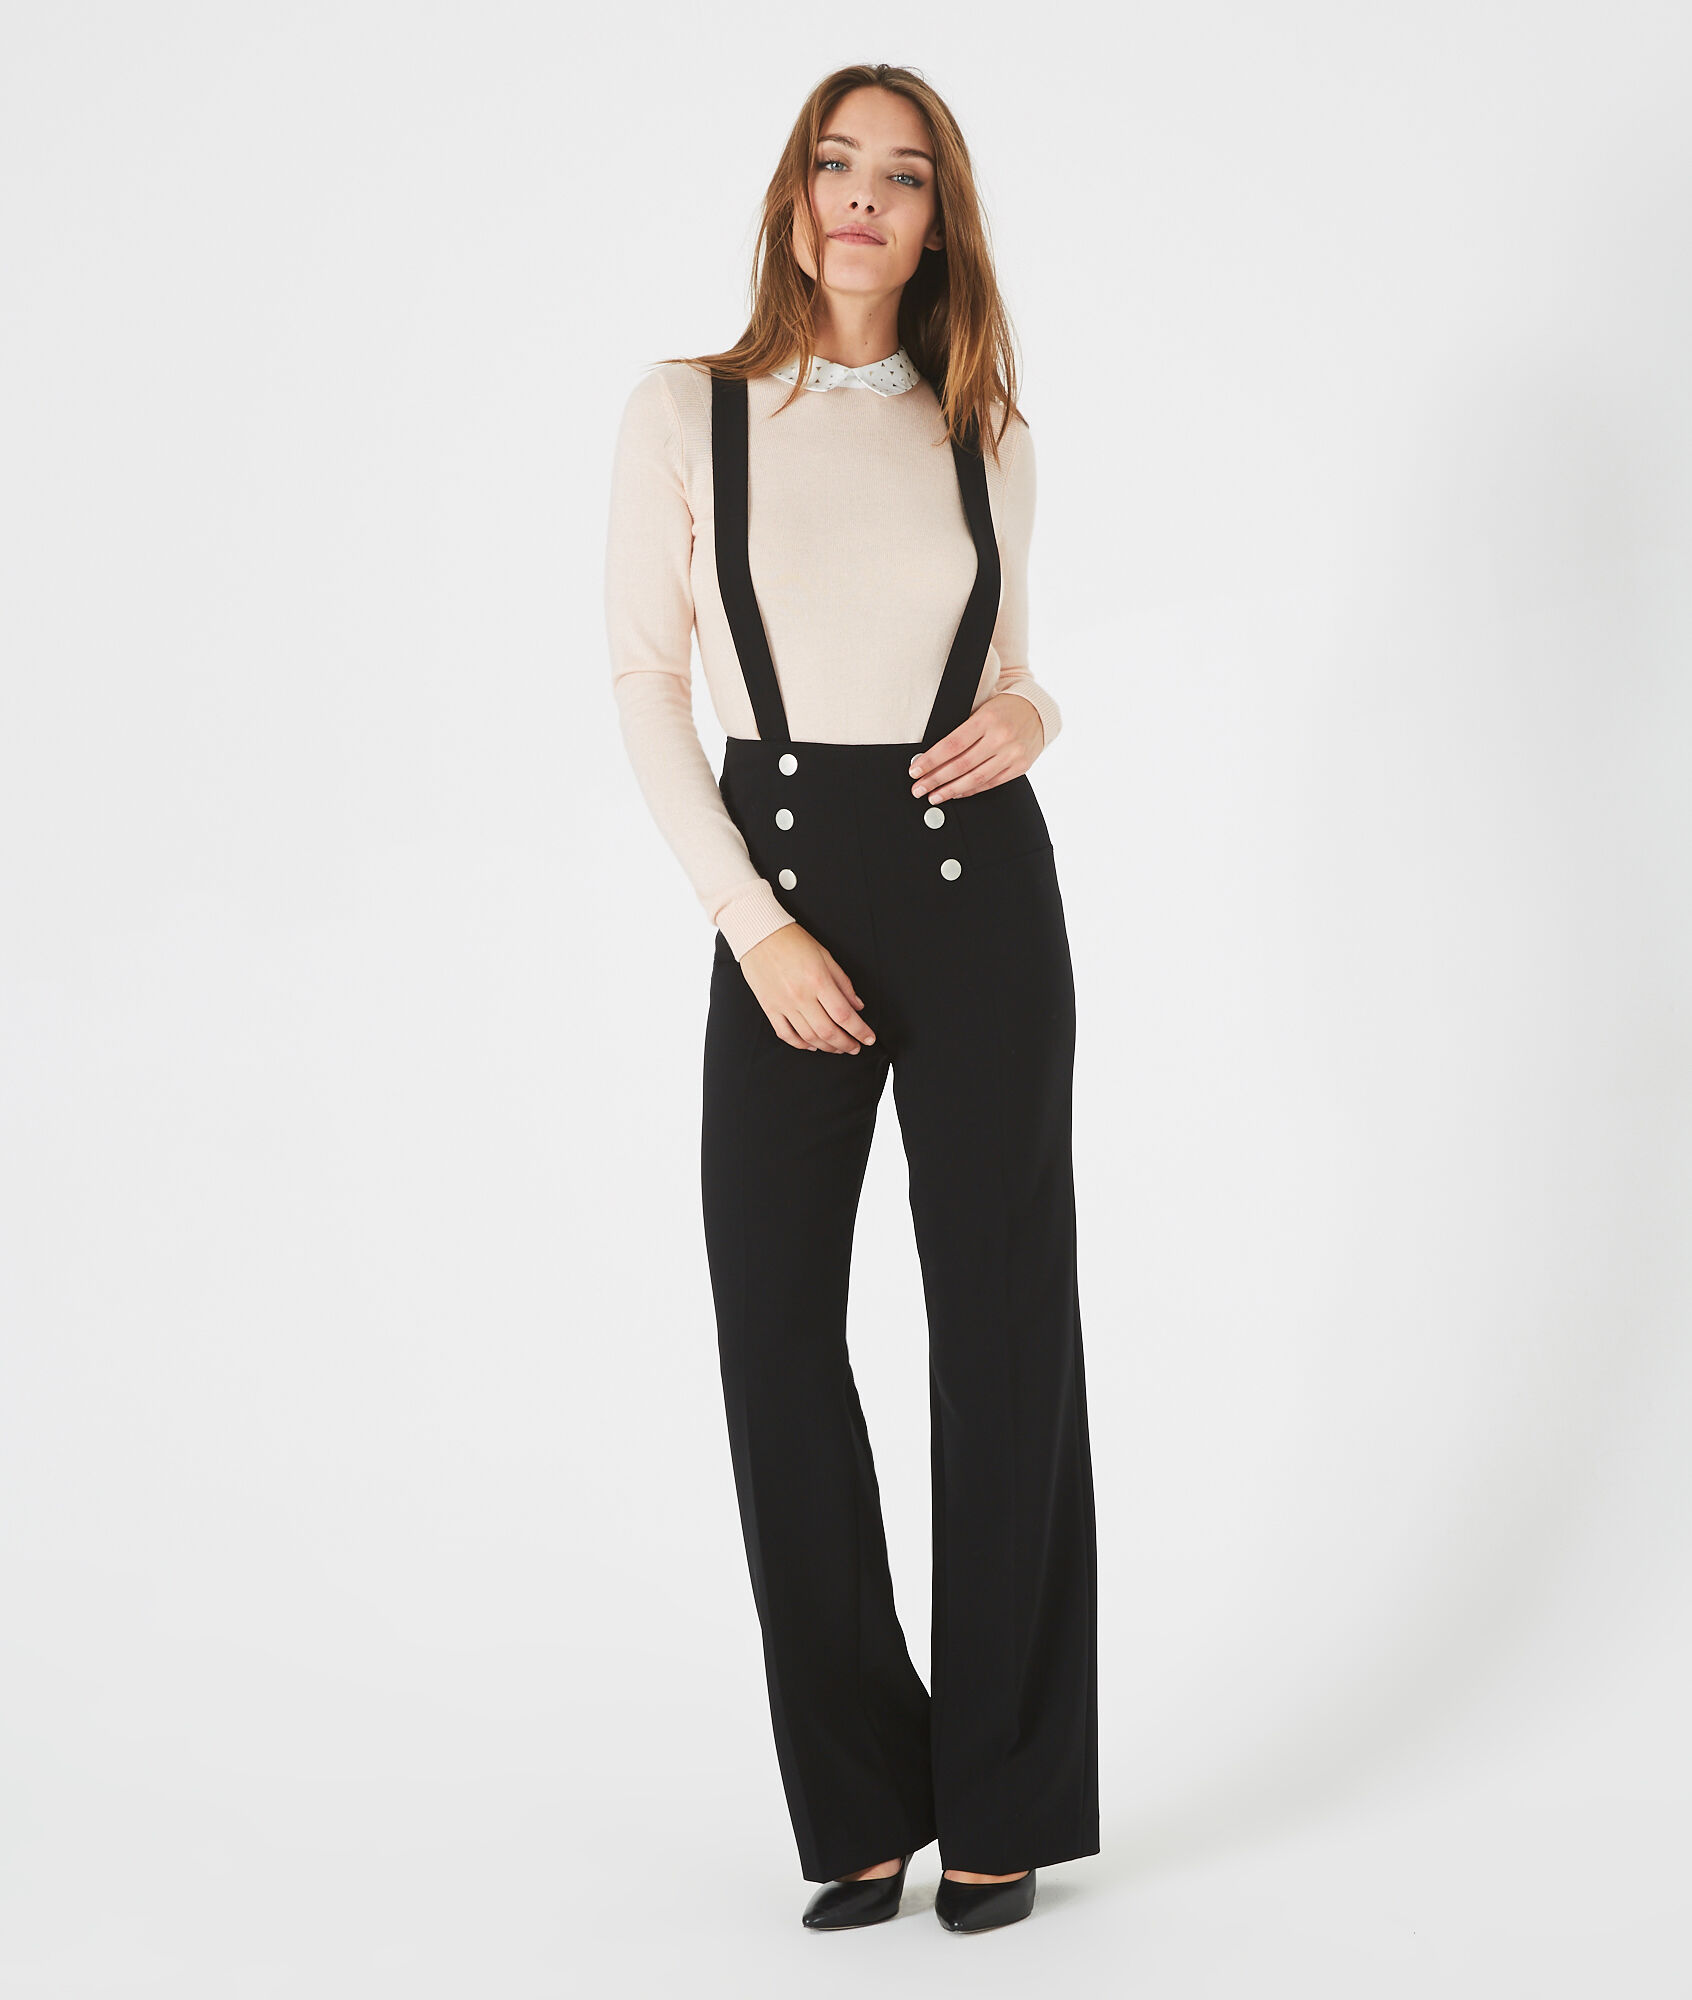 ensemble pantalon femme chic fashion designs. Black Bedroom Furniture Sets. Home Design Ideas